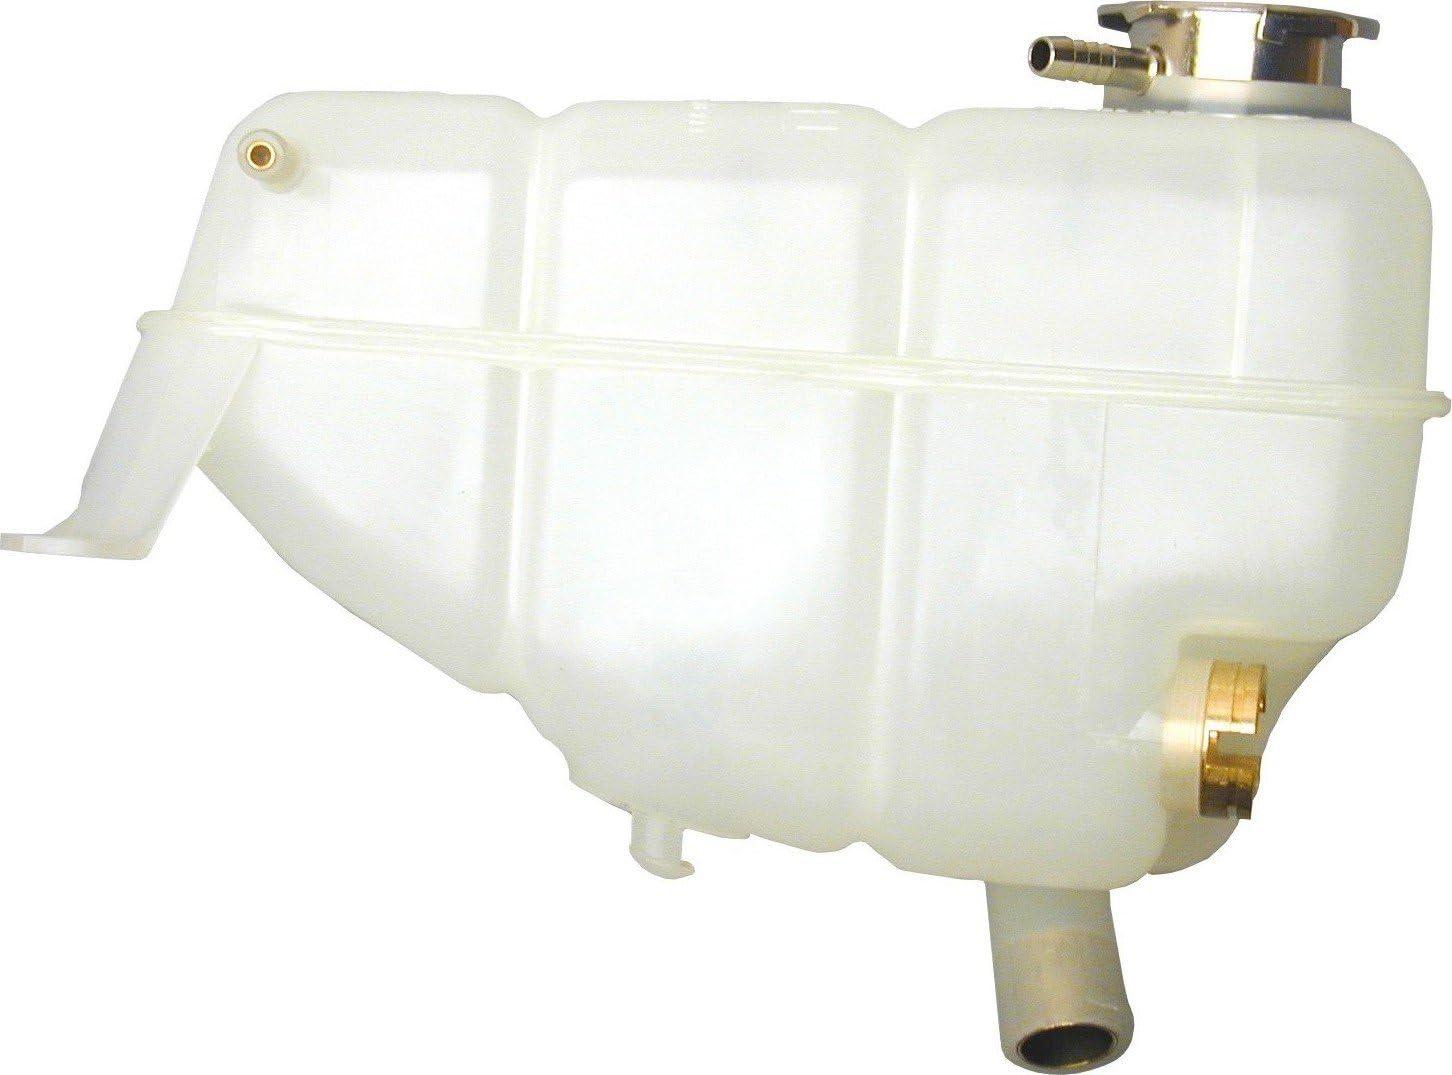 URO Parts 124 500 1349 Expansion Tank